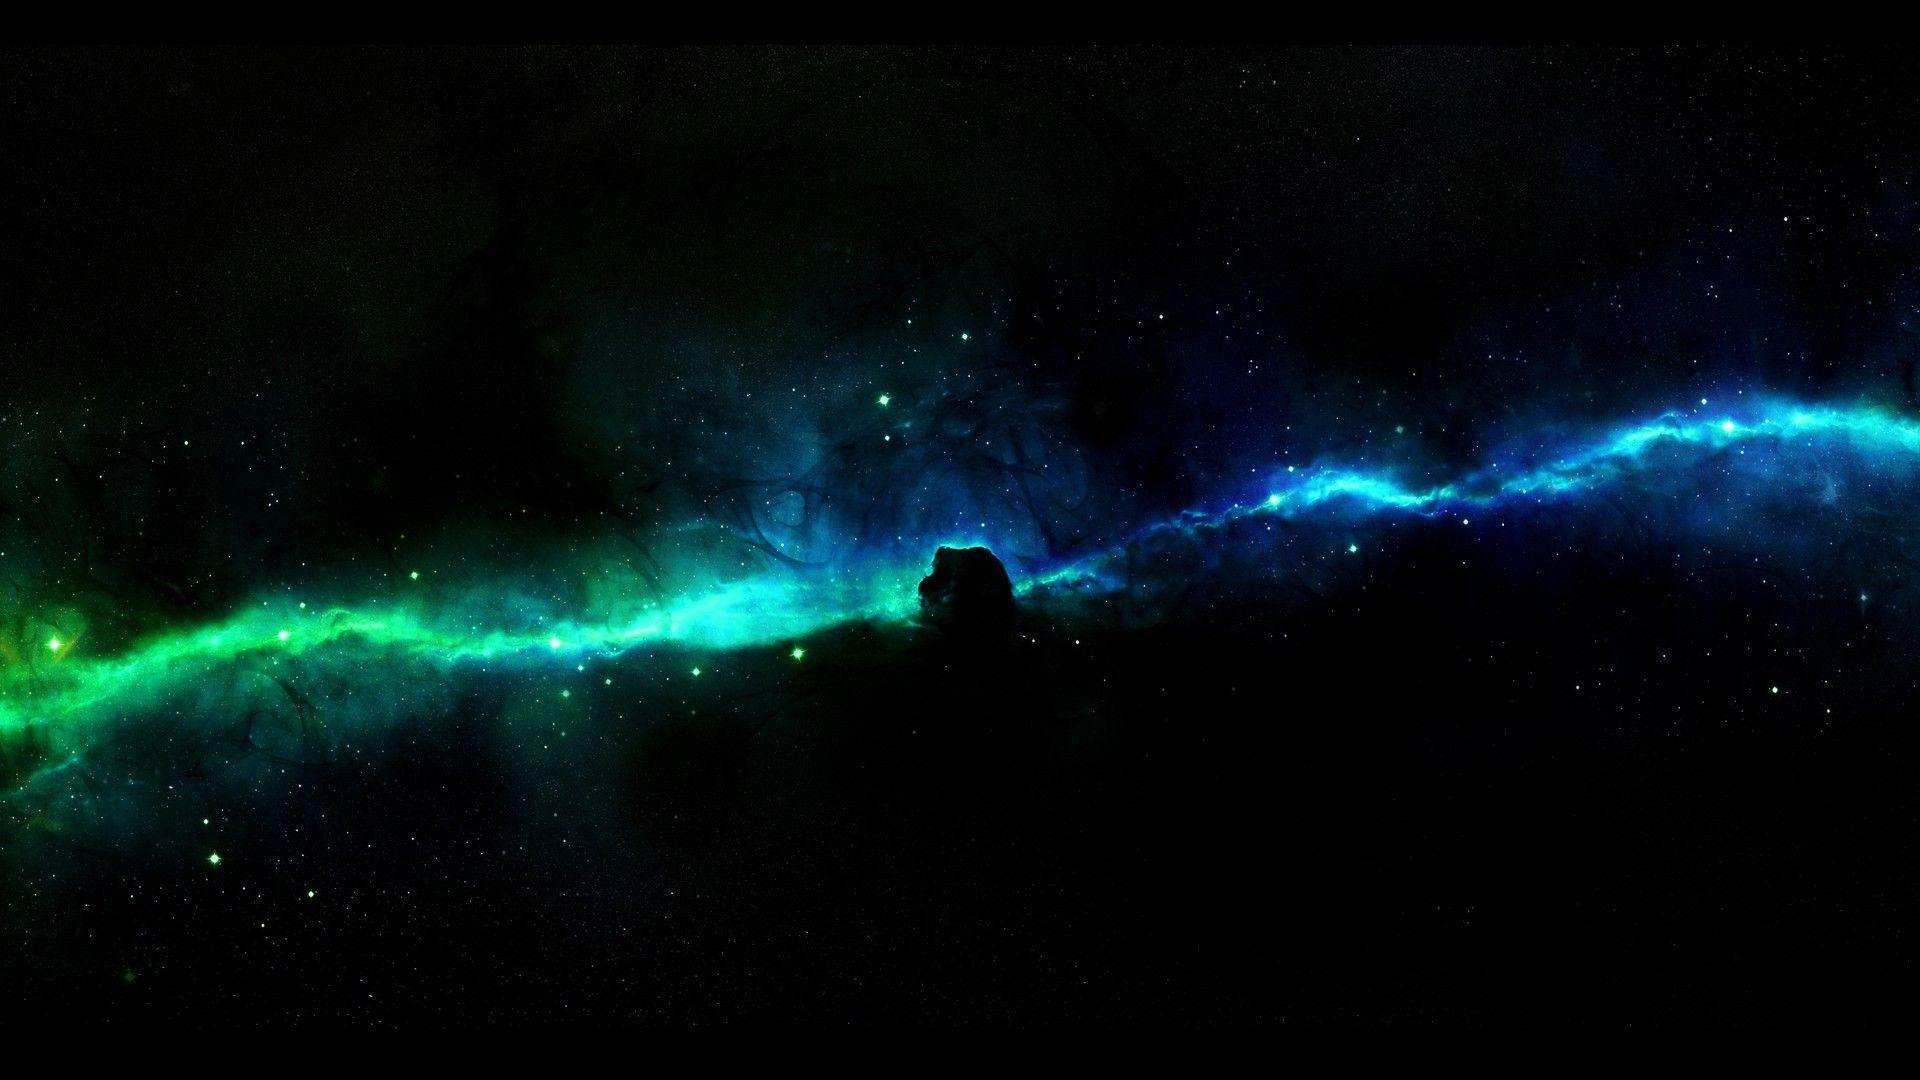 Horsehead Nebula wallpaper   1070698 1920x1080